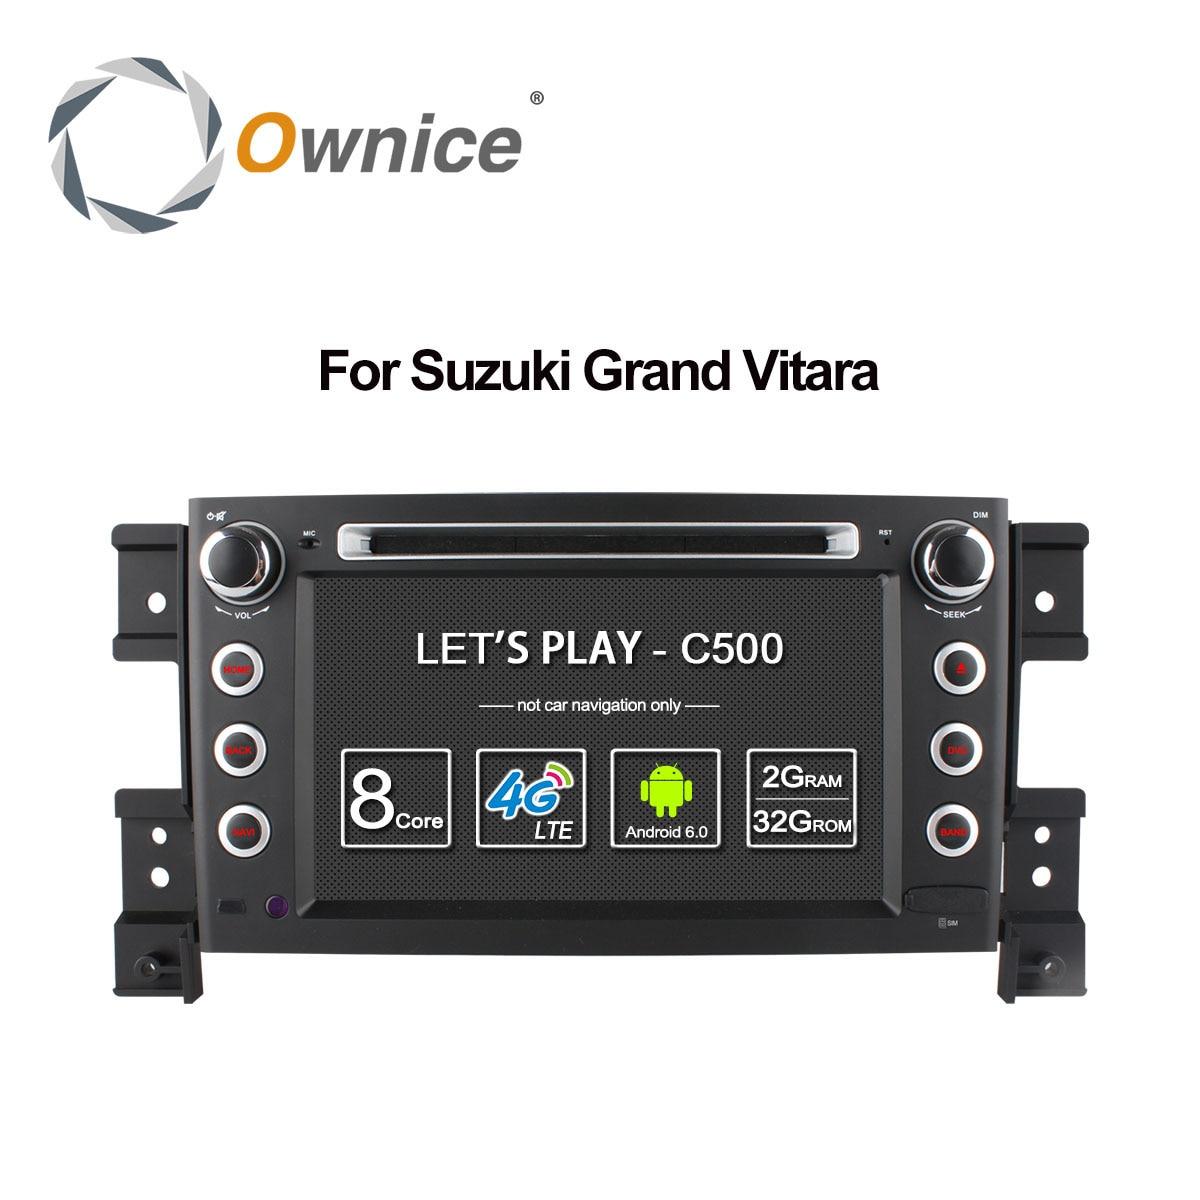 Автомобильный DVD-плеер, 4G SIM LTE 1024*600 Octa 8 Core Android 6,0 для SUZUKI GRAND VITARA 2005-2015, навигация GPS РАДИО wifi 32G ROM